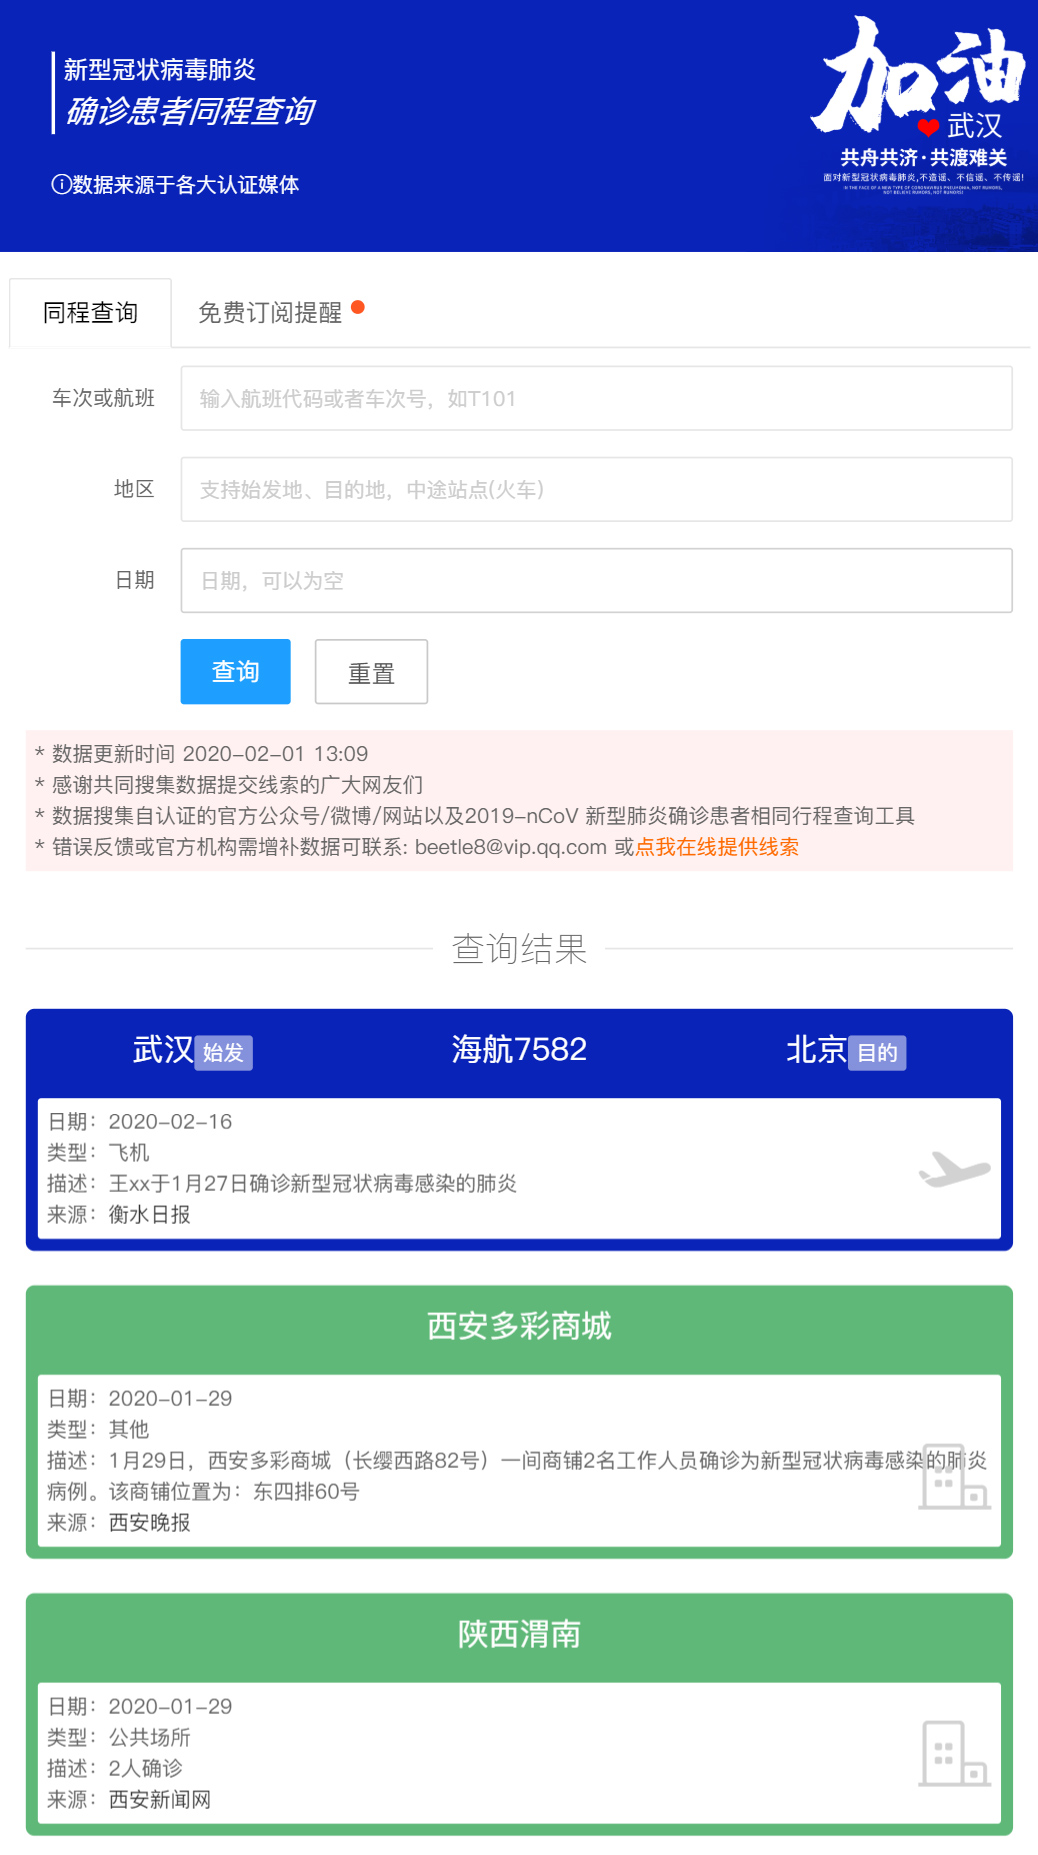 screencapture-suo-ski-ncov-2020-02-01-15_56_23